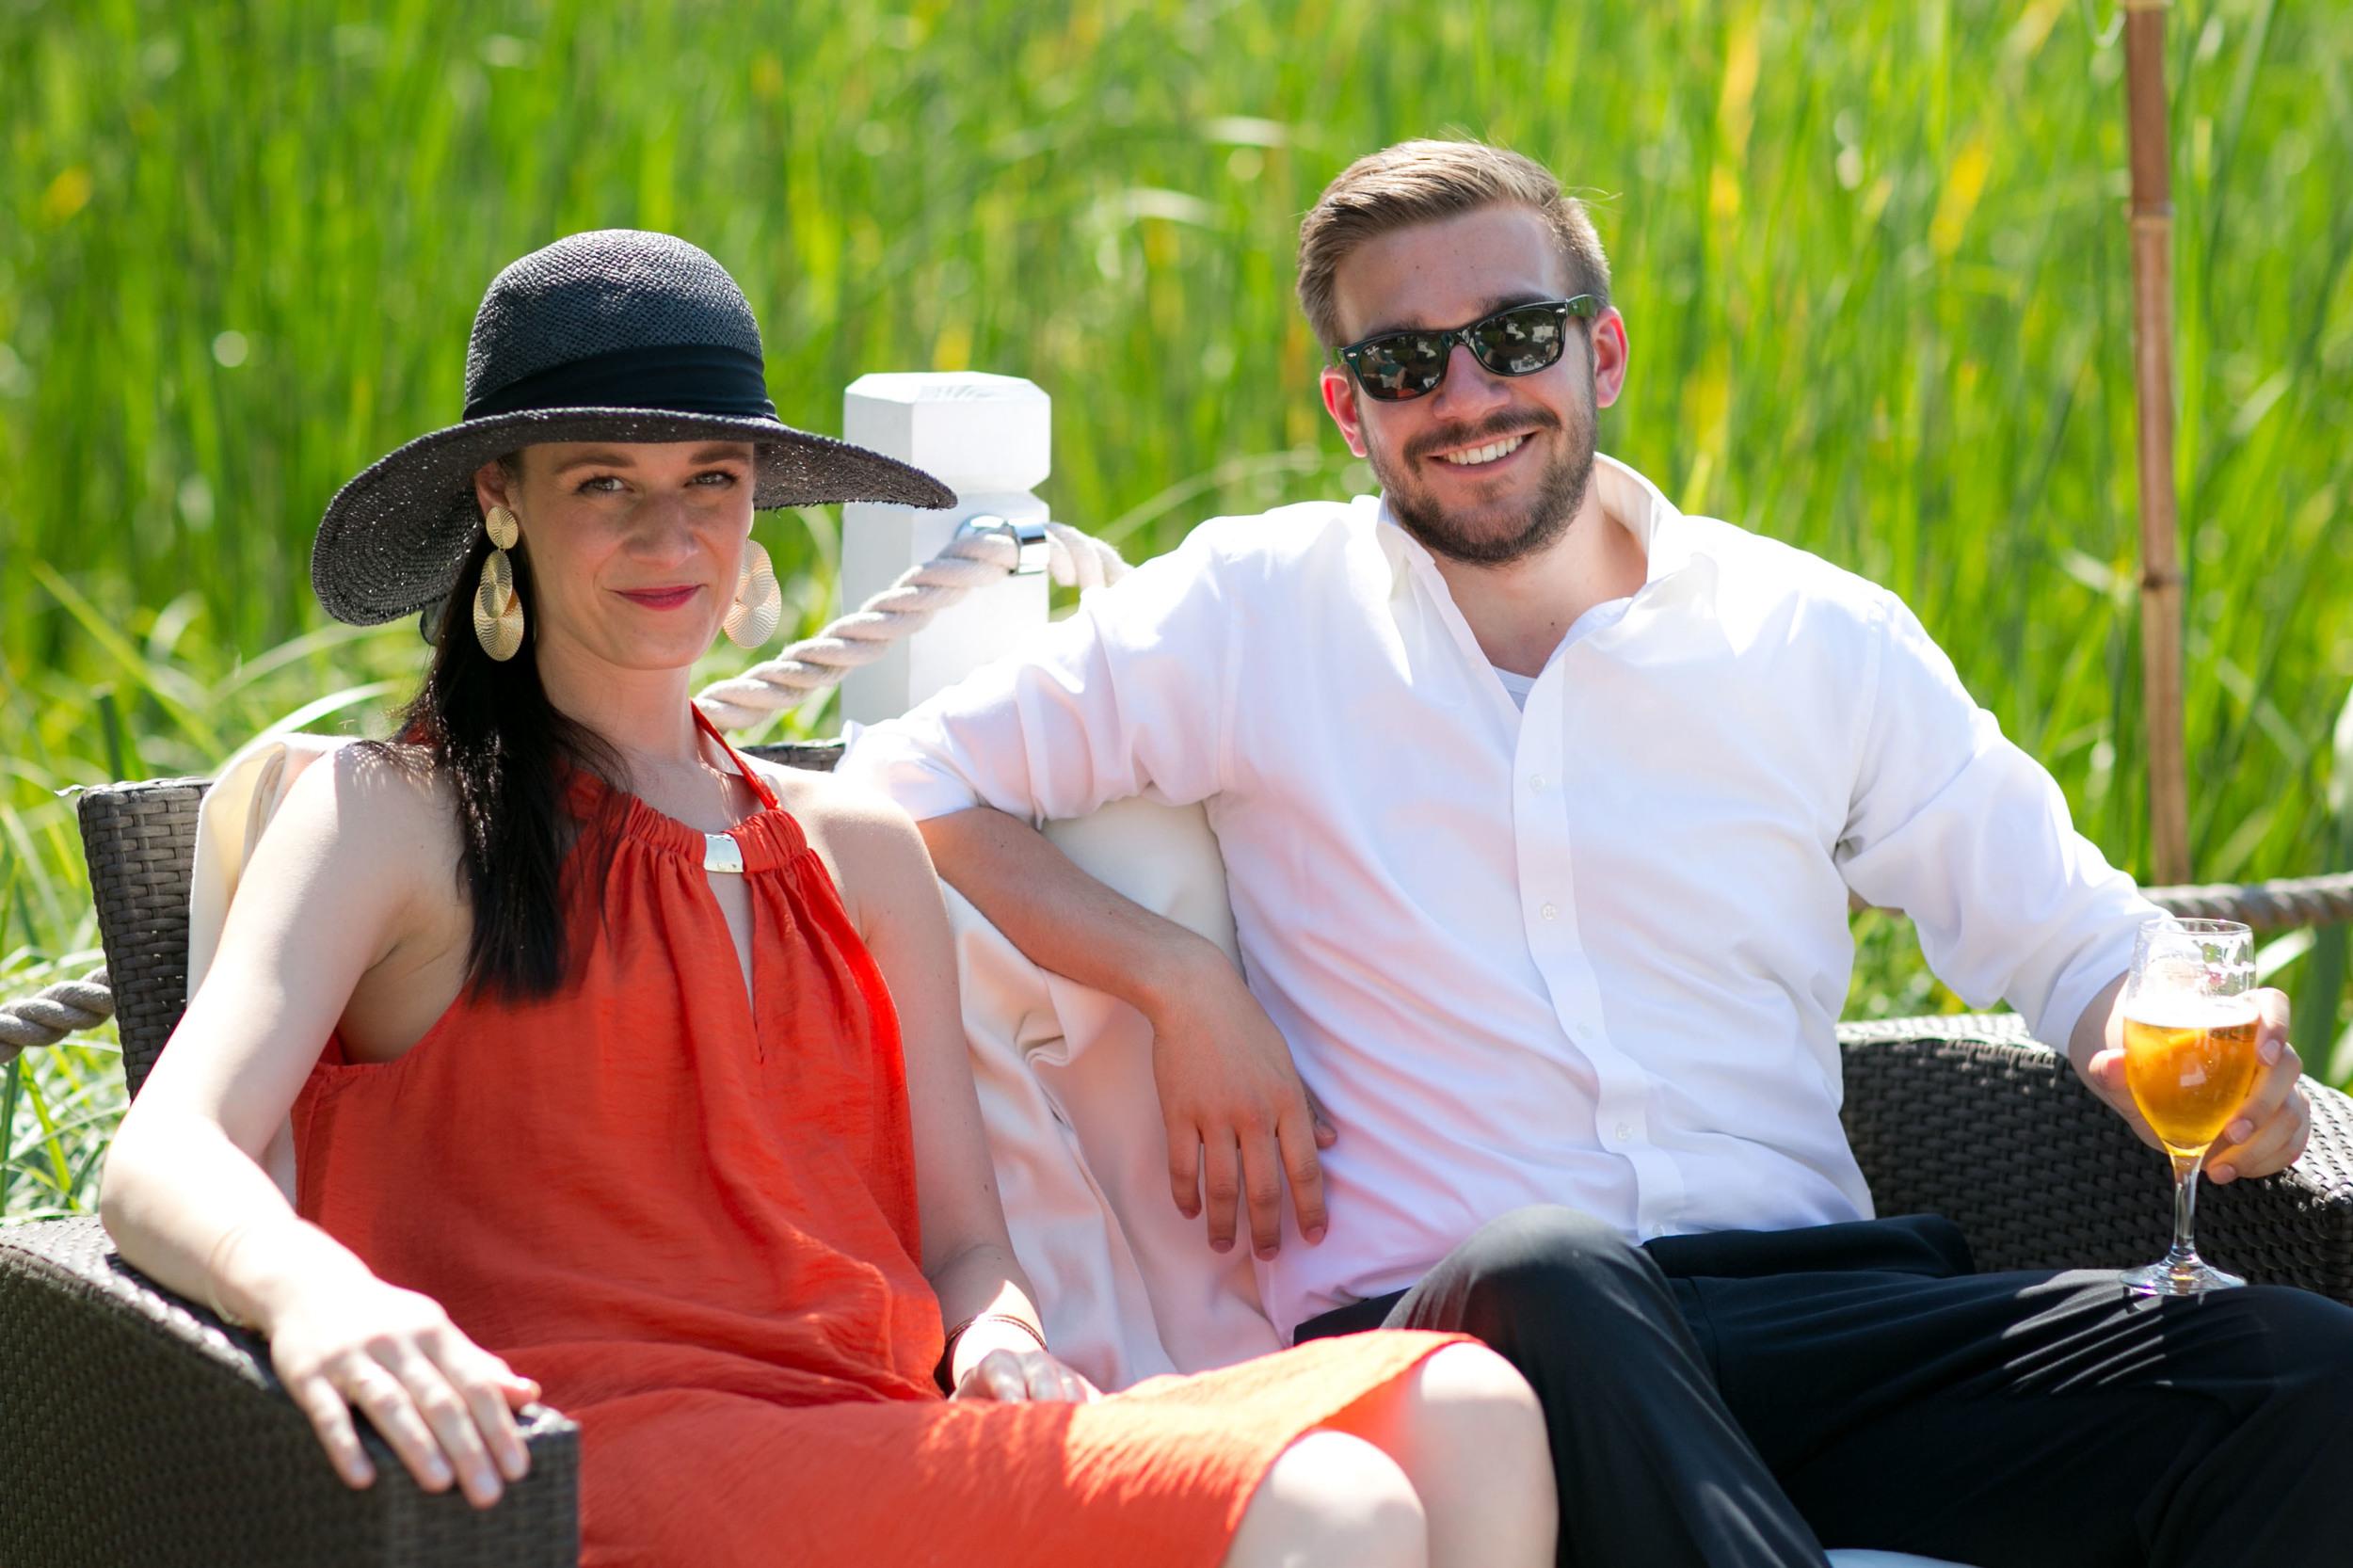 Hochzeitsfotografie Berlin_Fran Burrows Fotografie-286.jpg